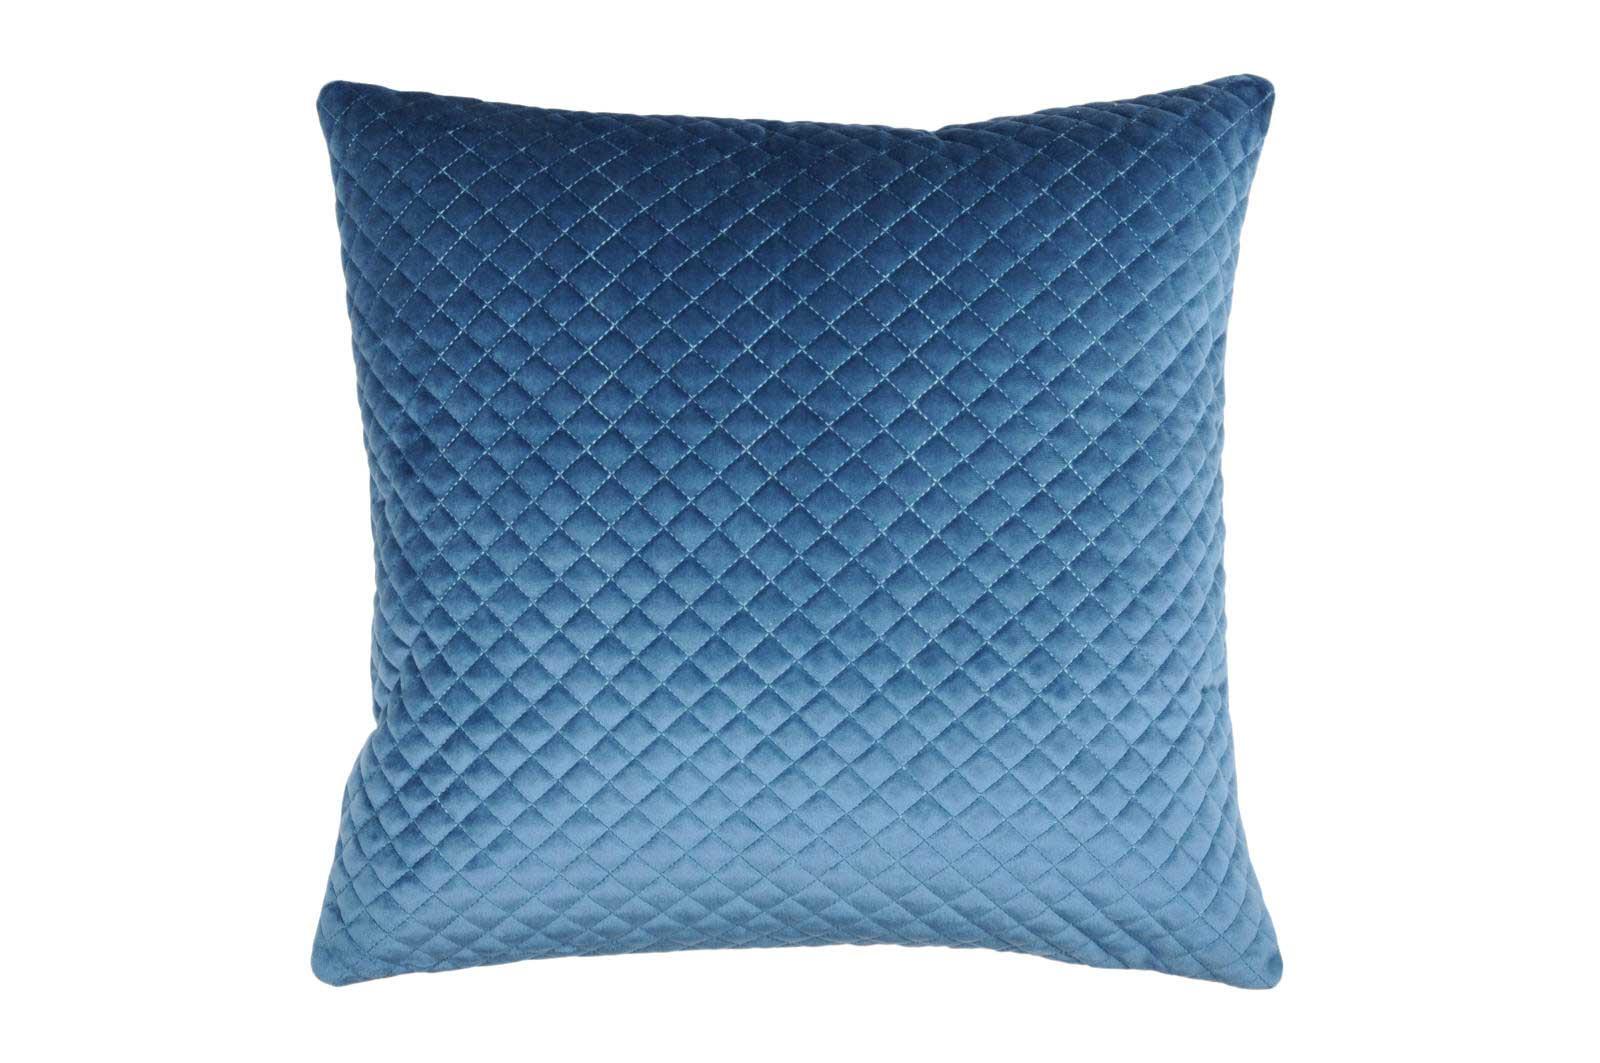 coussin effet matelass bleu camel c ladon noir blanc rouge taupe lin. Black Bedroom Furniture Sets. Home Design Ideas